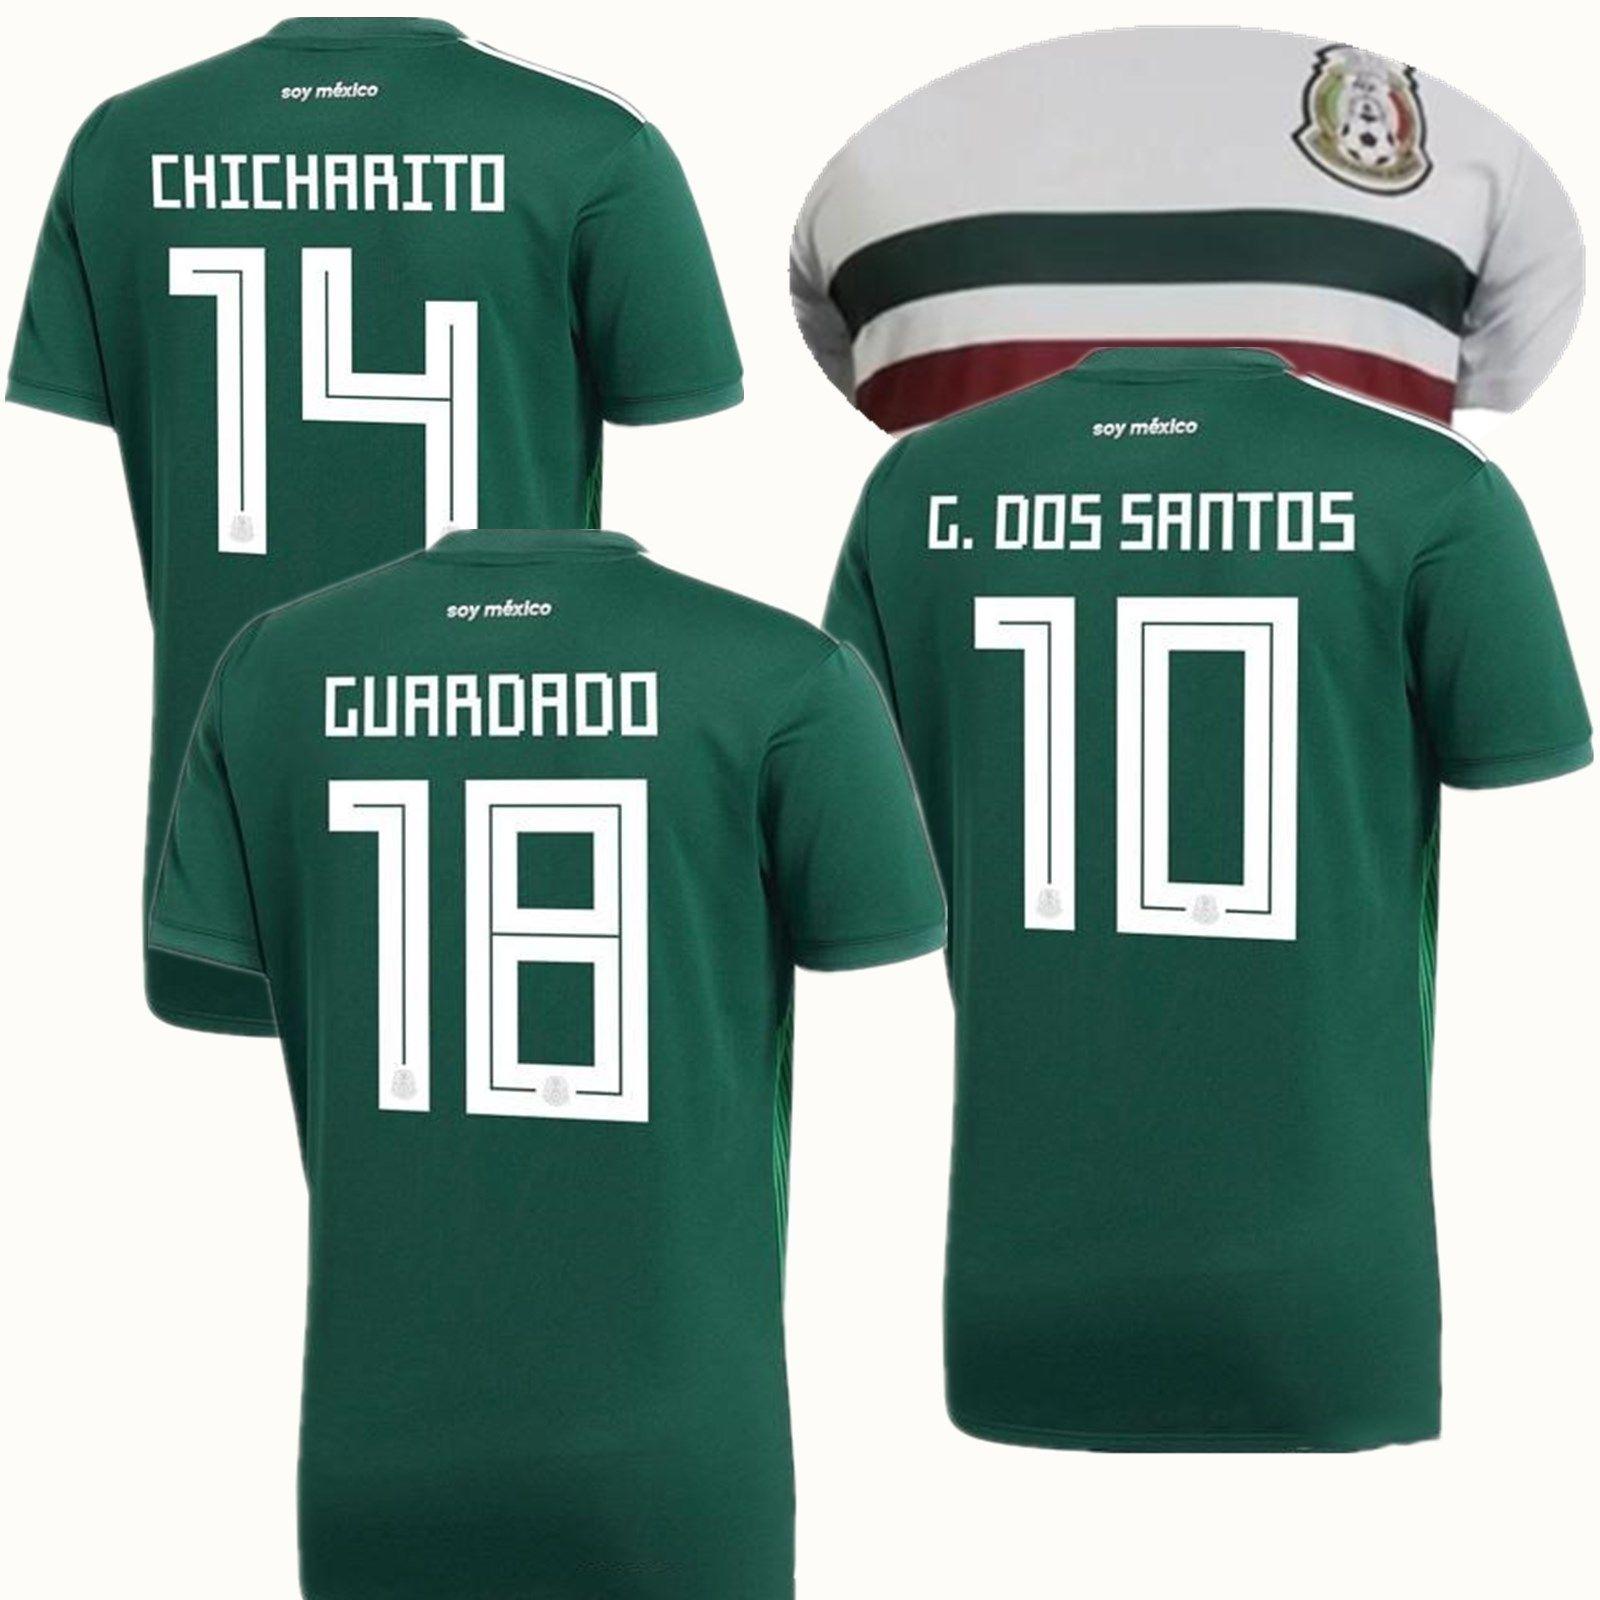 1b26d619c 2019 2018 World Cup Mexico Jersey Home Green G.DOS SANTOS 14 CHICHARITO  J.Hernandez M.Layun A.Reyes Soccer Jerseys Football Shirts Kit From  Huihuawang09